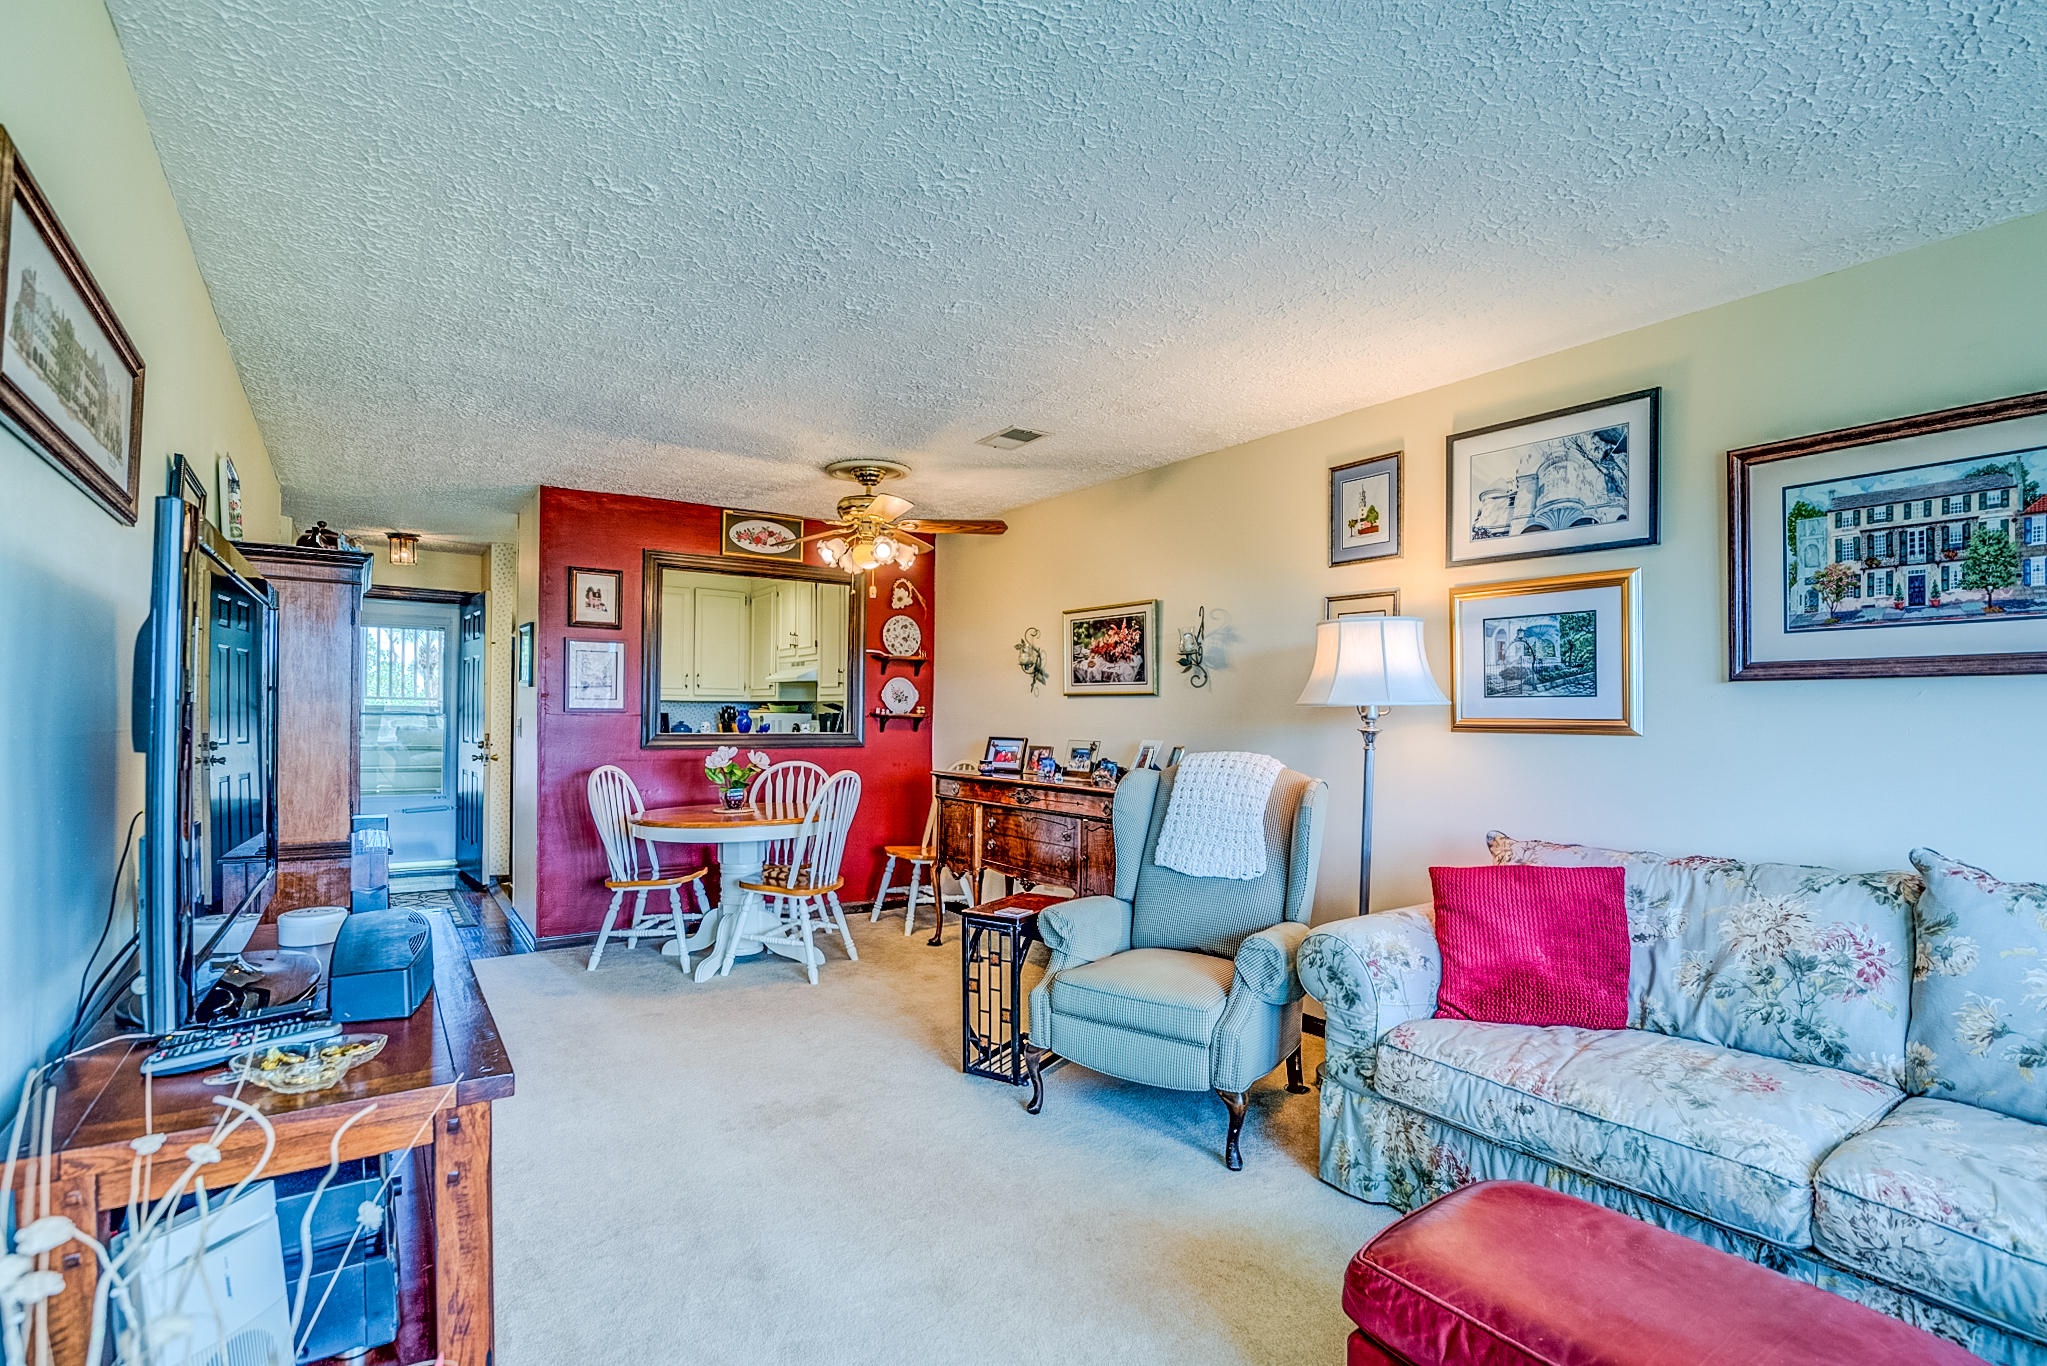 Bay Pointe Villas Homes For Sale - 2127 Landfall, Johns Island, SC - 6